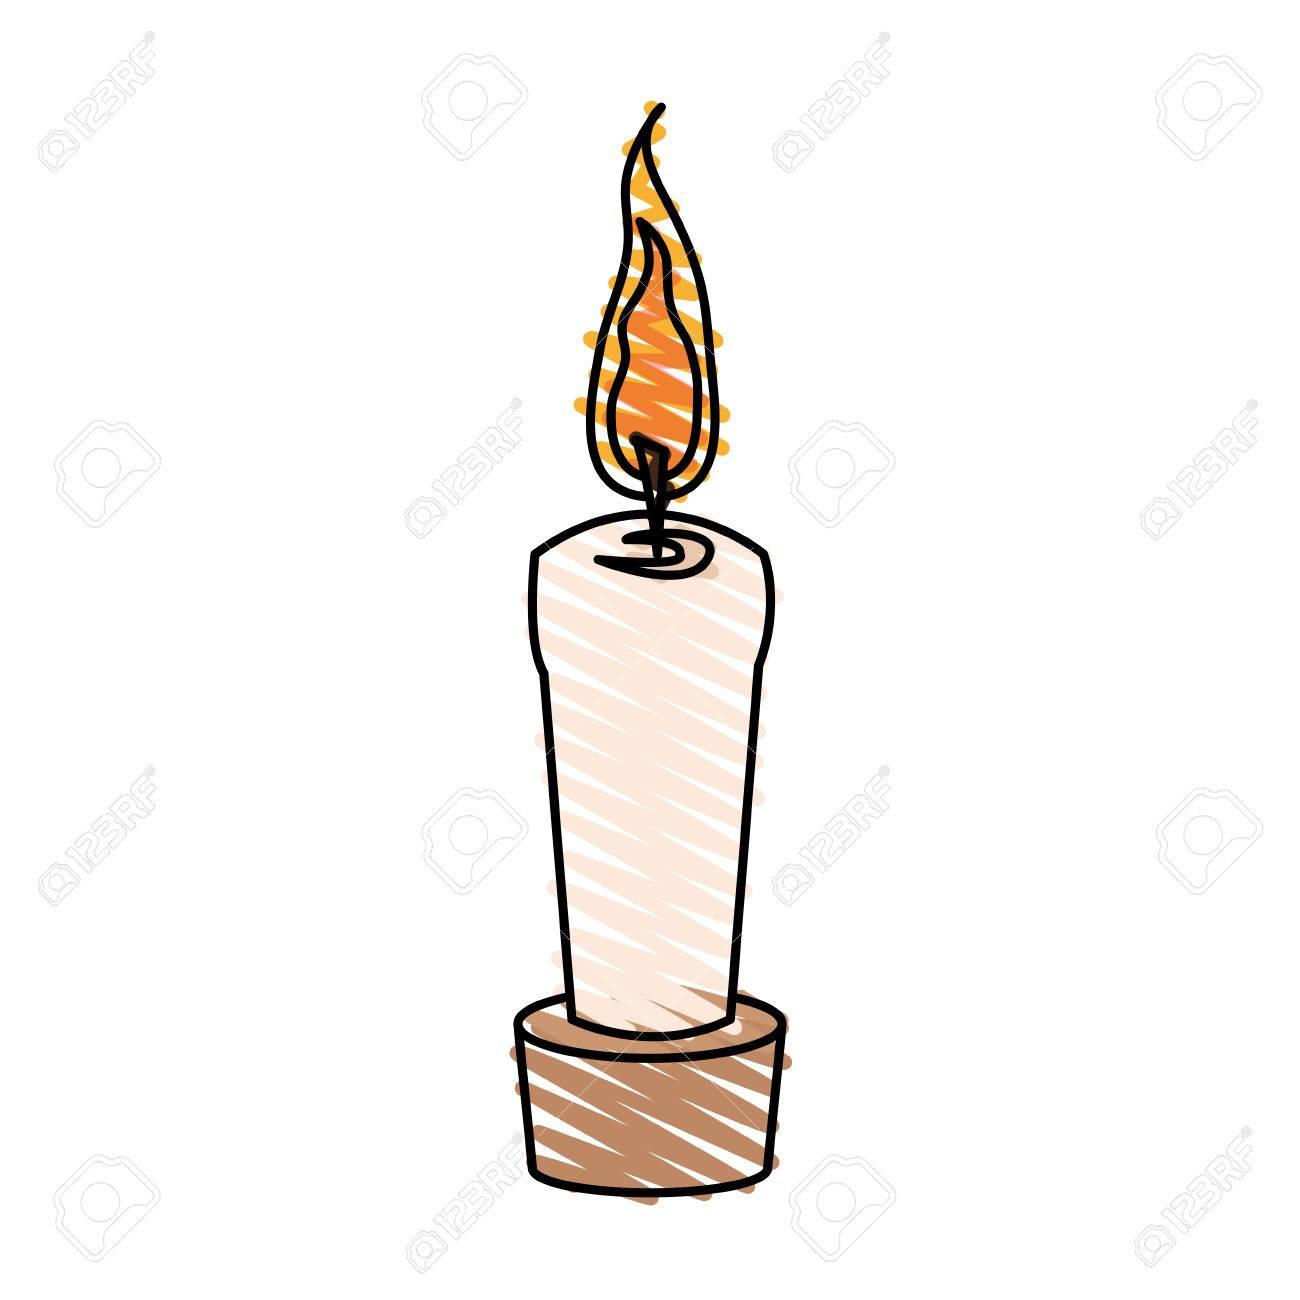 Color Crayon Stripe Cartoon Decorative Candle Spa In Wooden Base Vector  Illustration destiné Dessin Sur Bougie